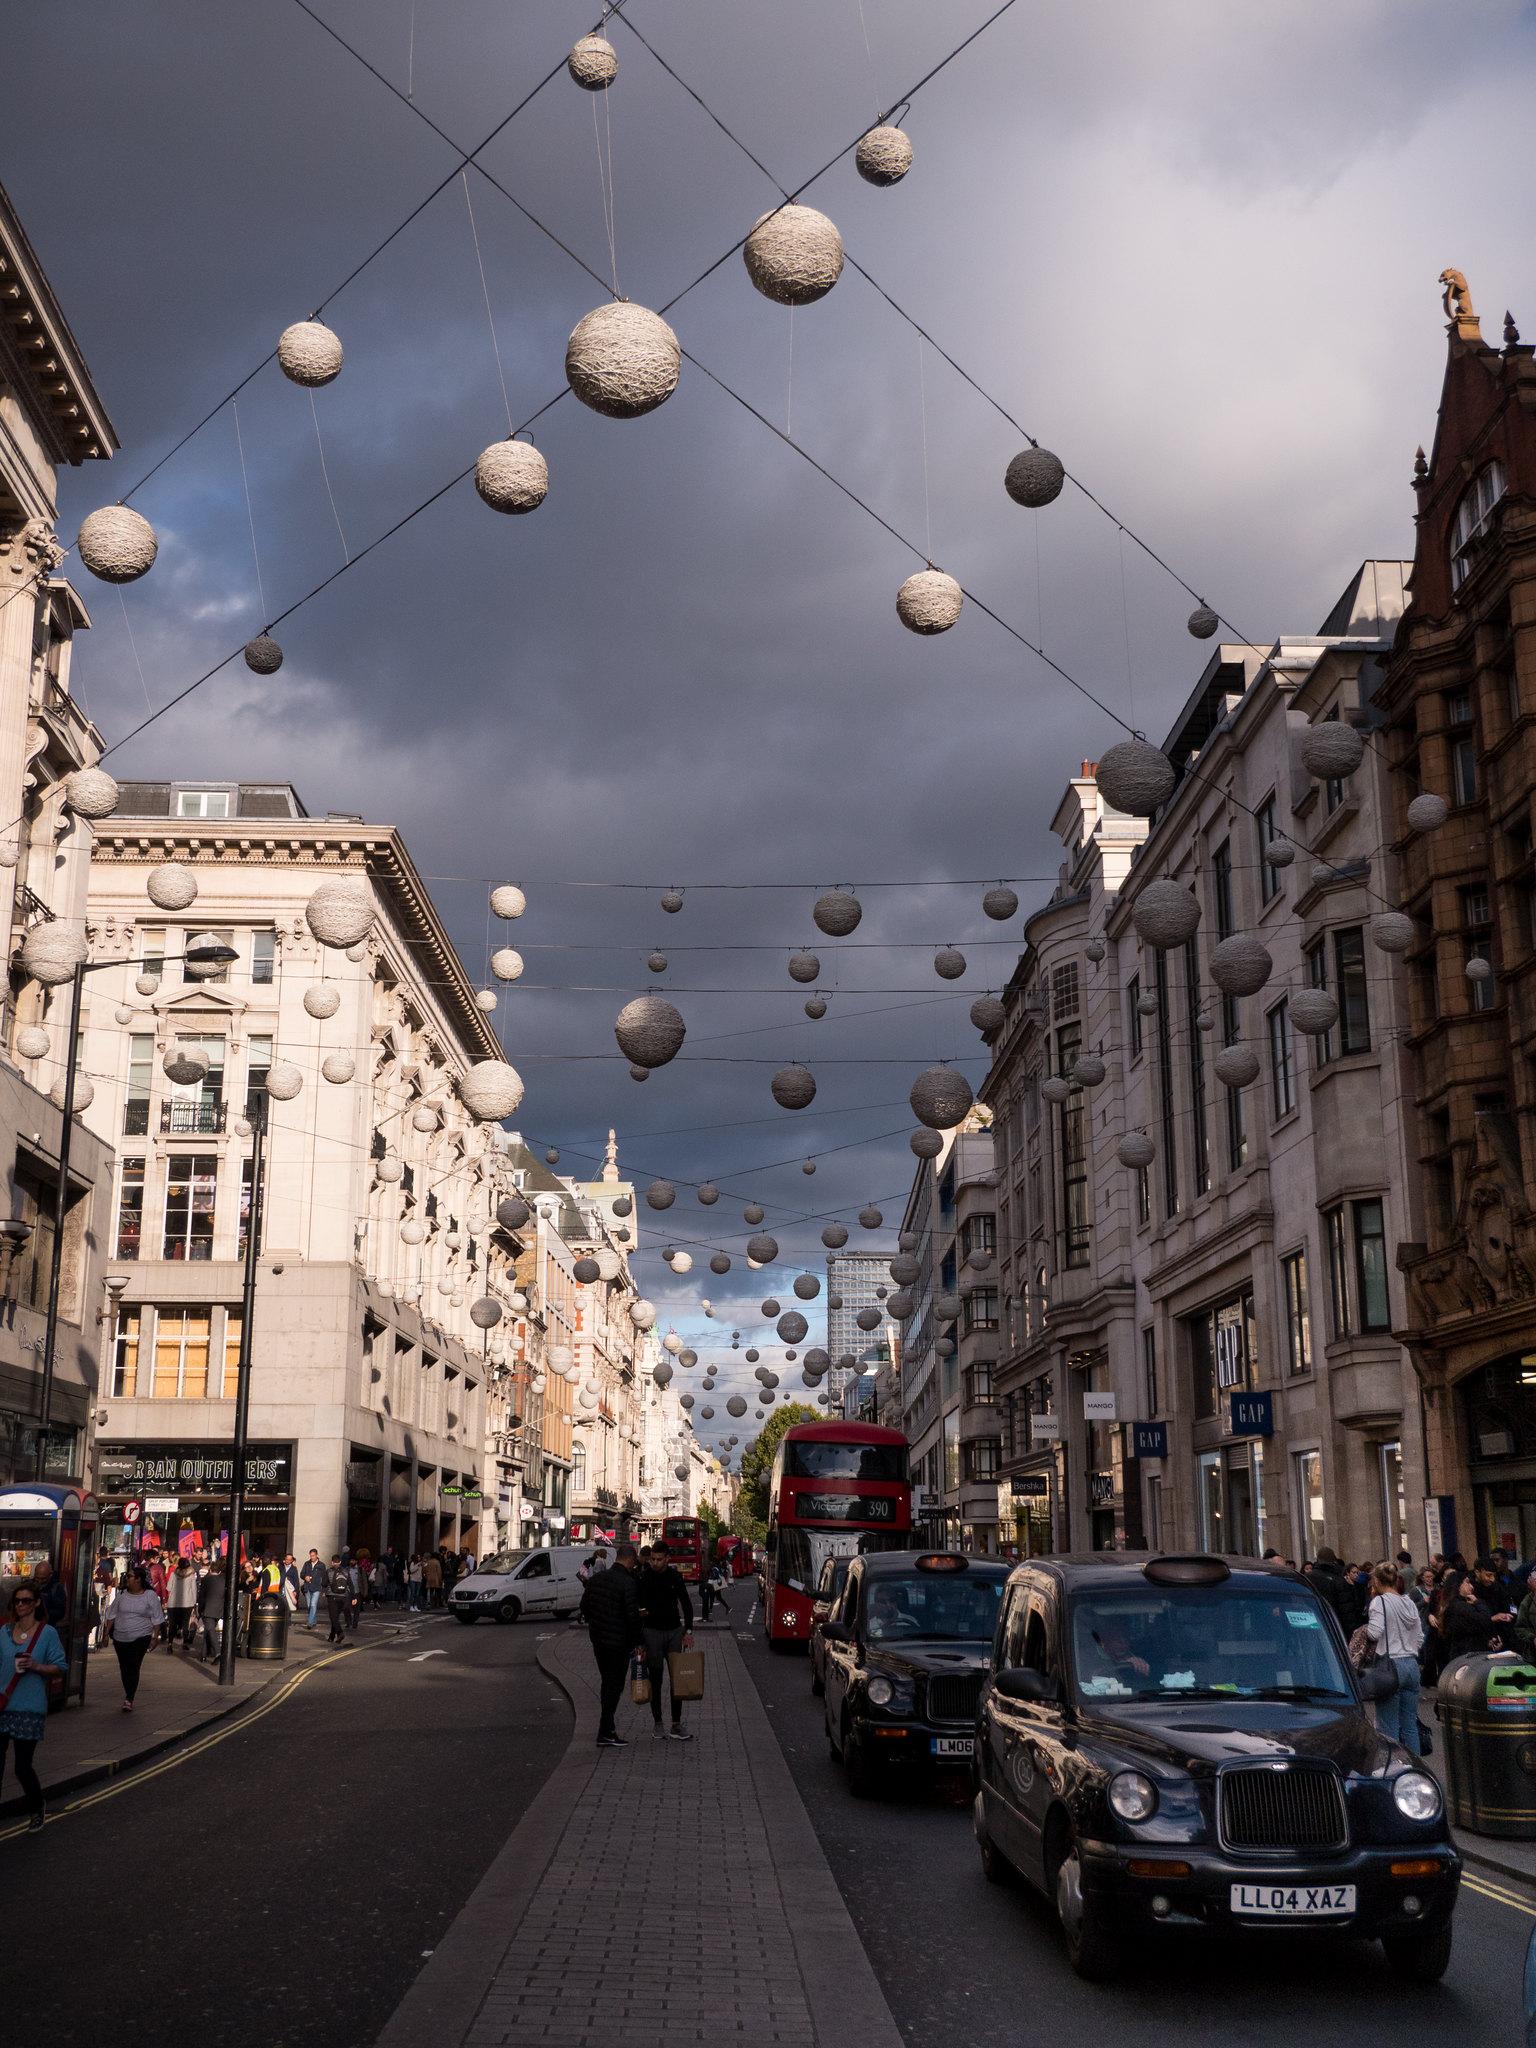 lontoo oxford street (2 of 10)